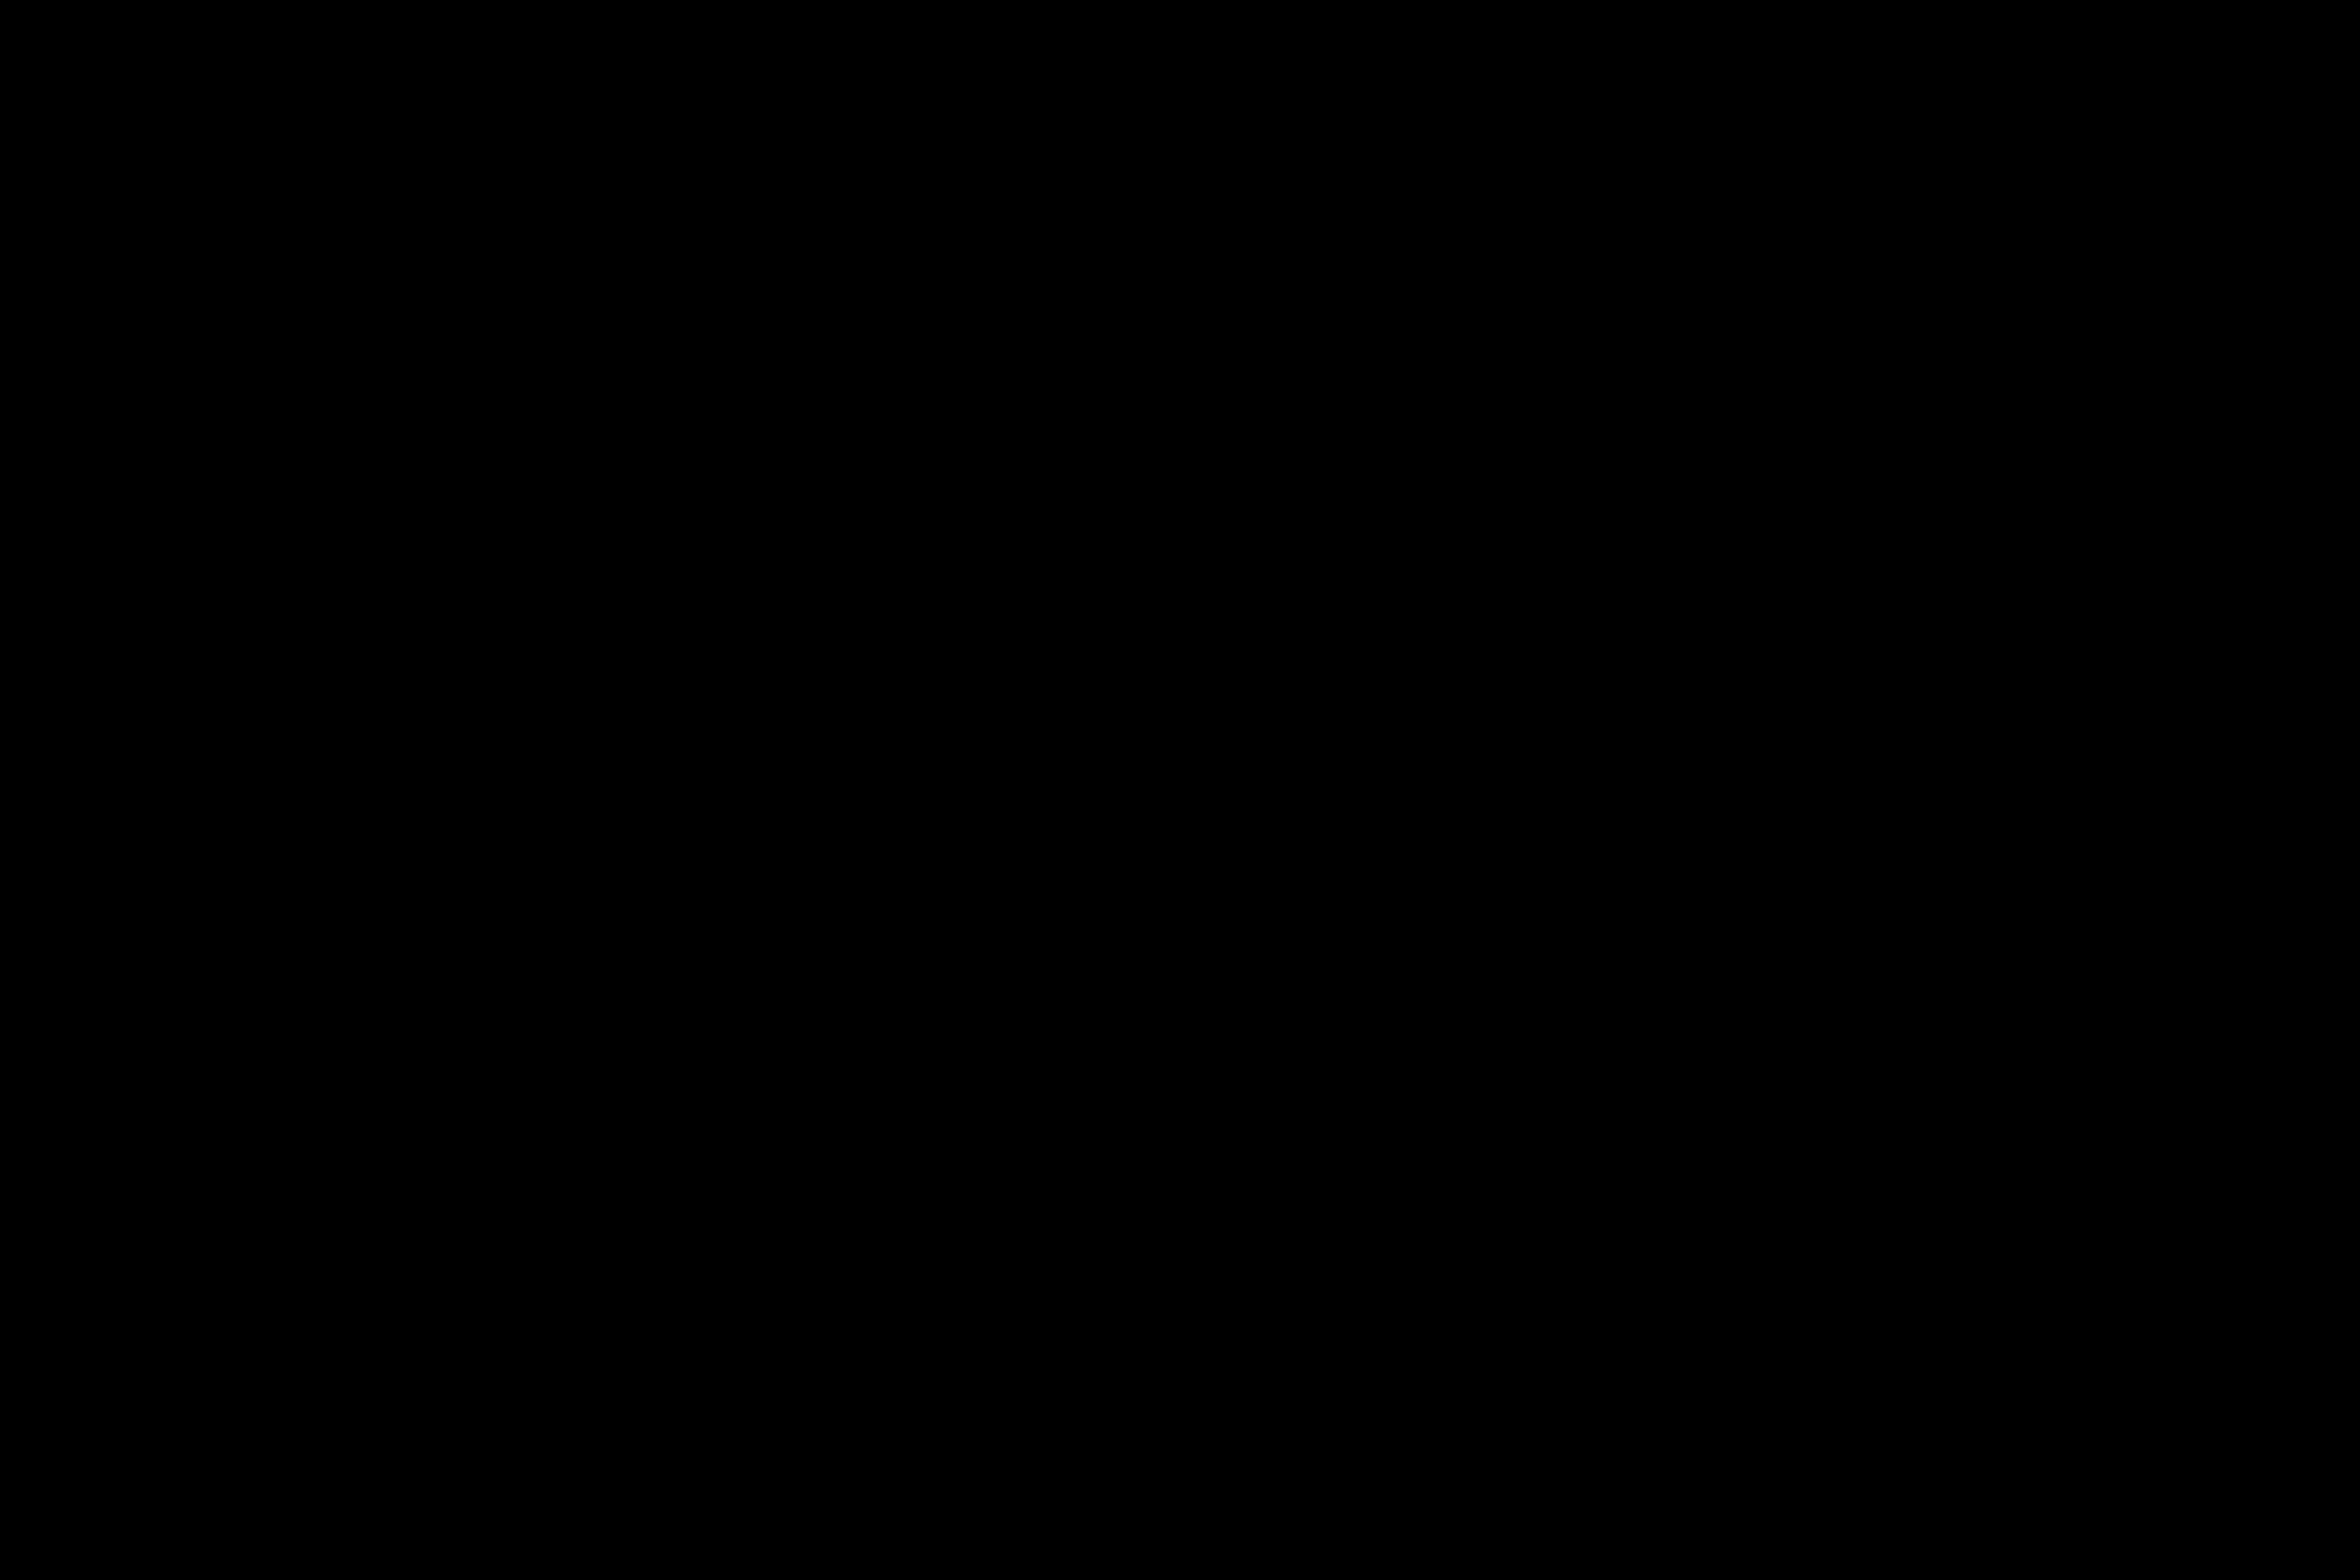 rj0511